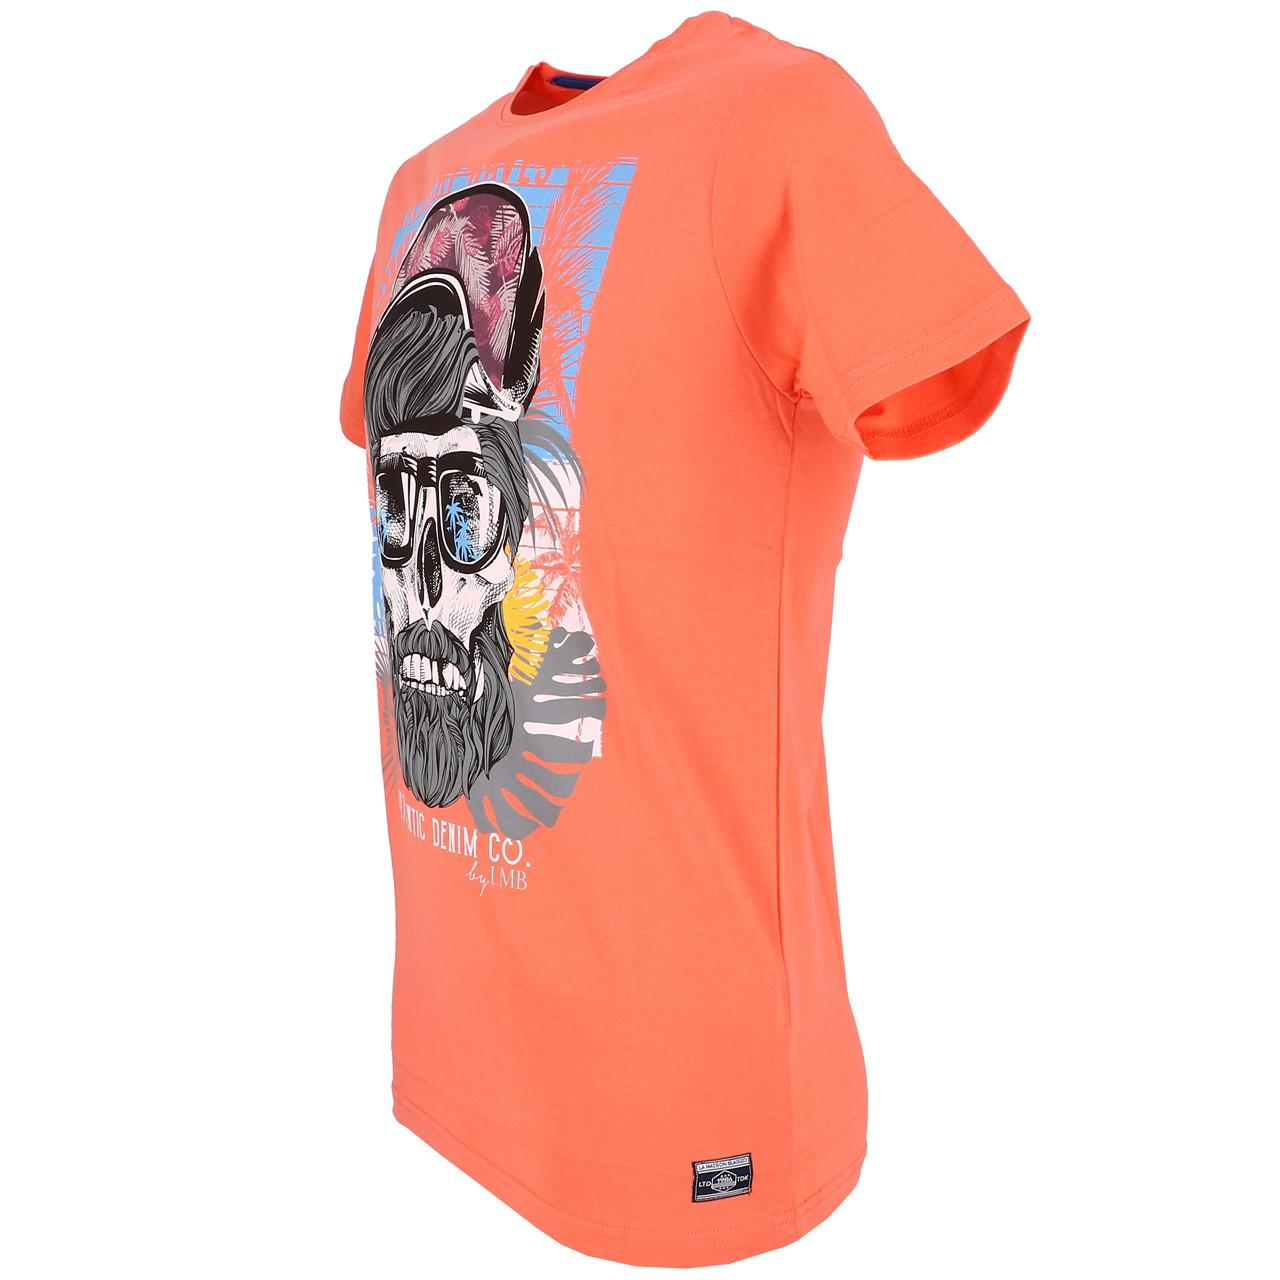 Short-La-maison-blaggio-Mably-Hot-Coral-Mc-Tee-Orange-93614 thumbnail 4